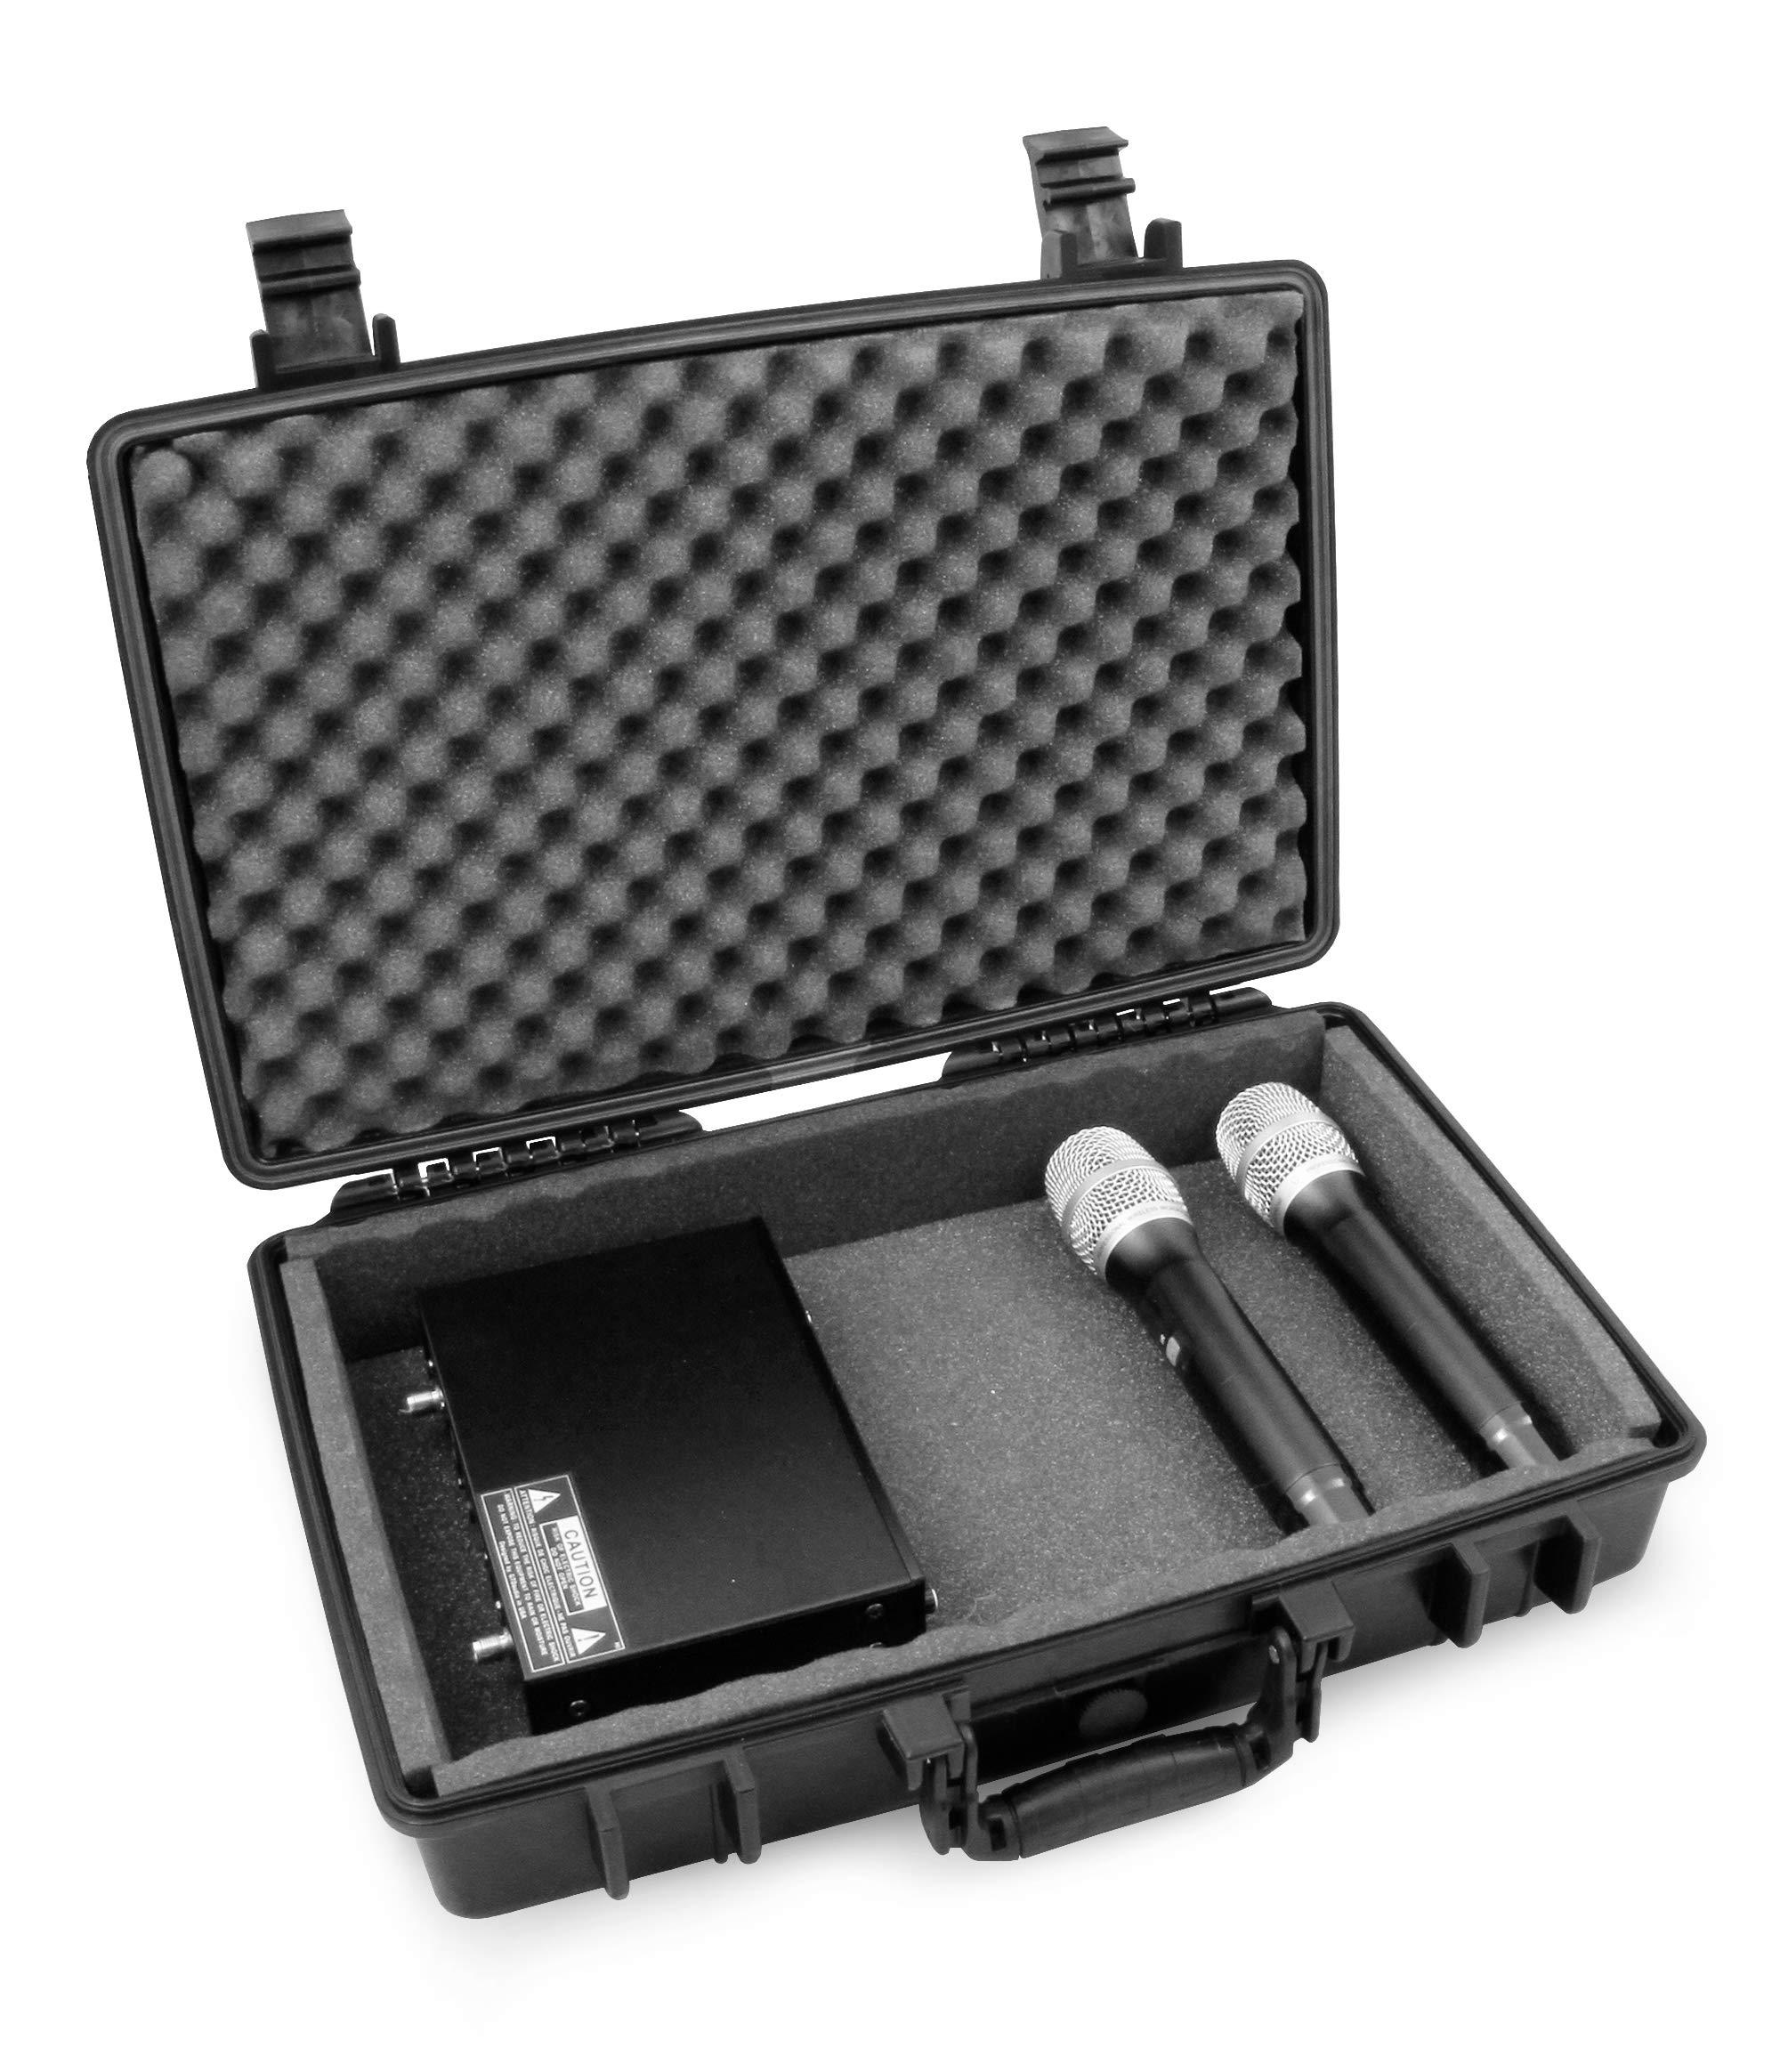 STUDIOCASE 2.0 PRO Wireless Microphone System Hard Case w/Foam - Fits Sennheiser, Shure, Audio-Technica, Nady, VocoPro, AKG Receiver, Body Transmitter, UHF Headset, Lavalier and Handheld Mics by CASEMATIX